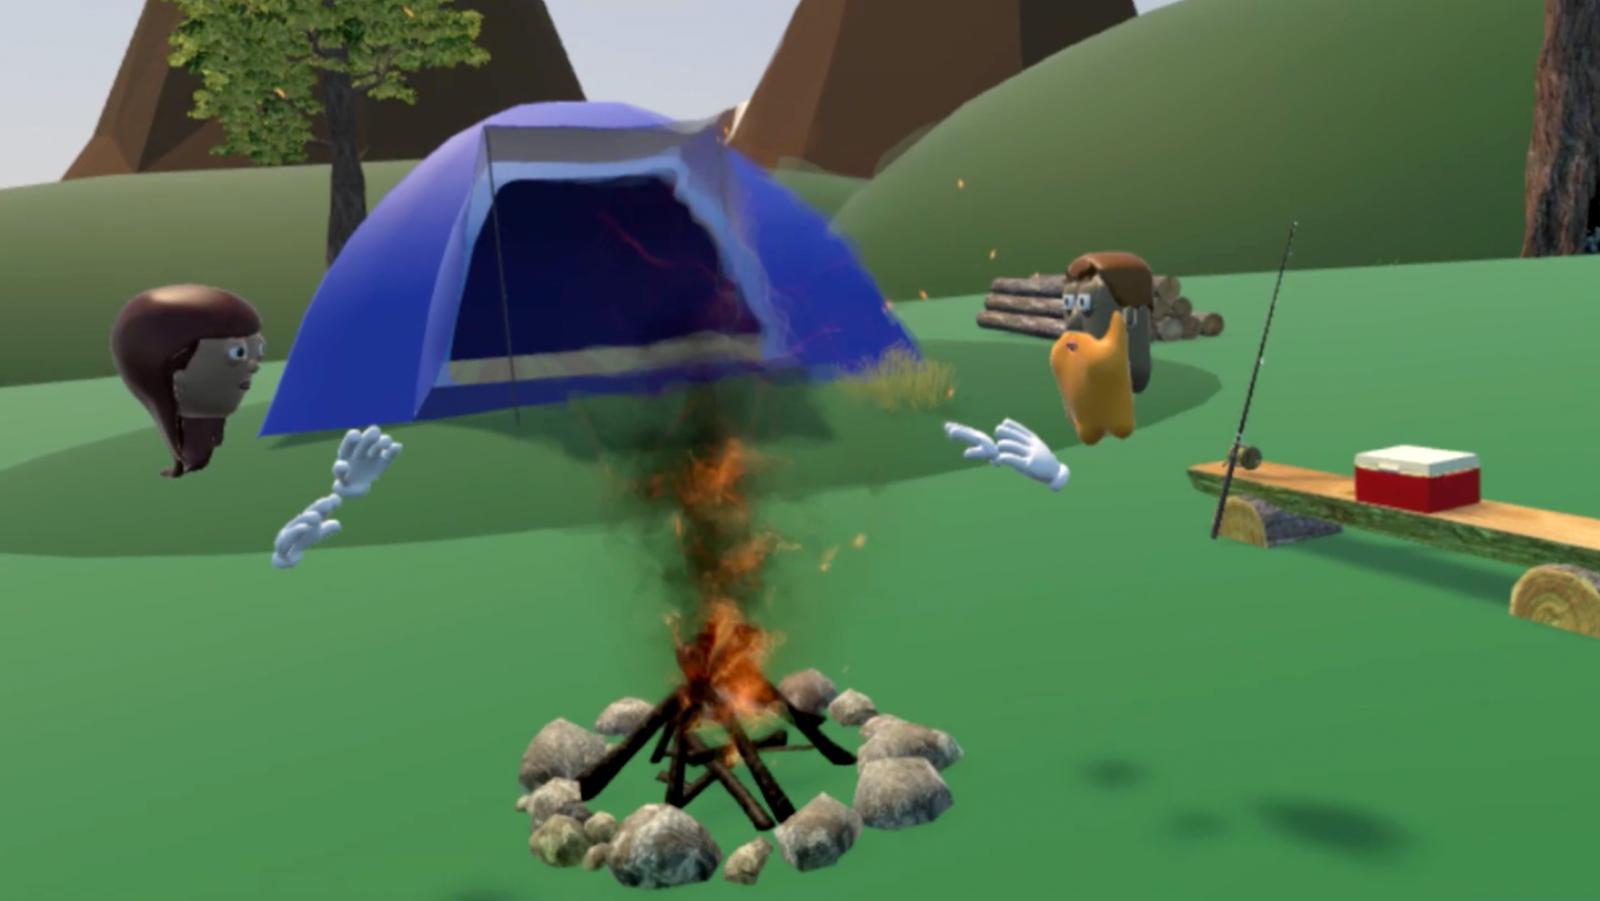 MetaWorld virtual reality camping